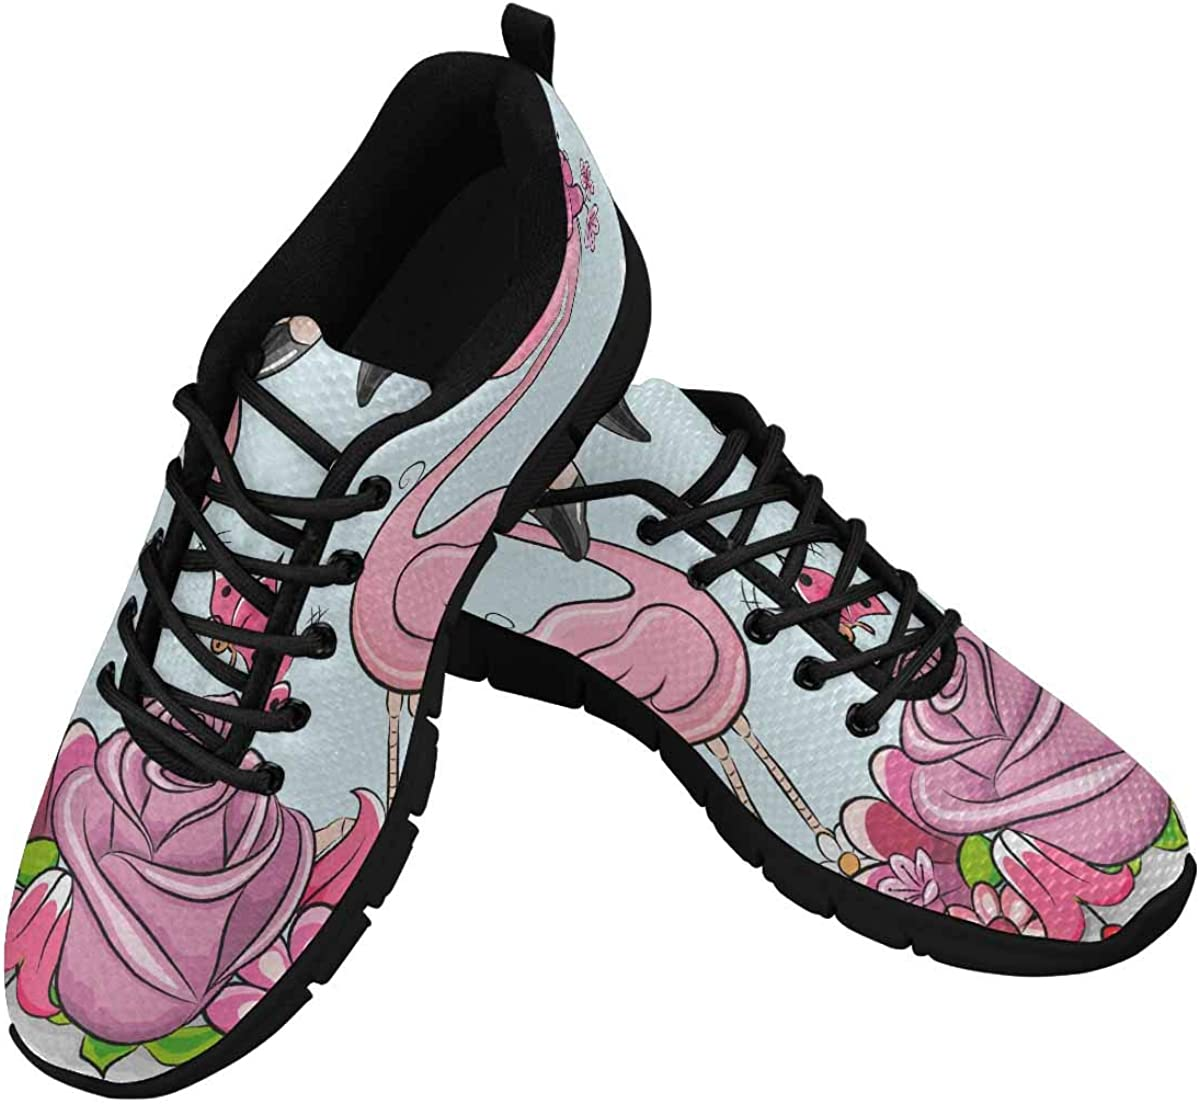 INTERESTPRINT Cartoon Flamingo Flowers Women's Sneaker Lace Up Running Comfort Sports Shoes